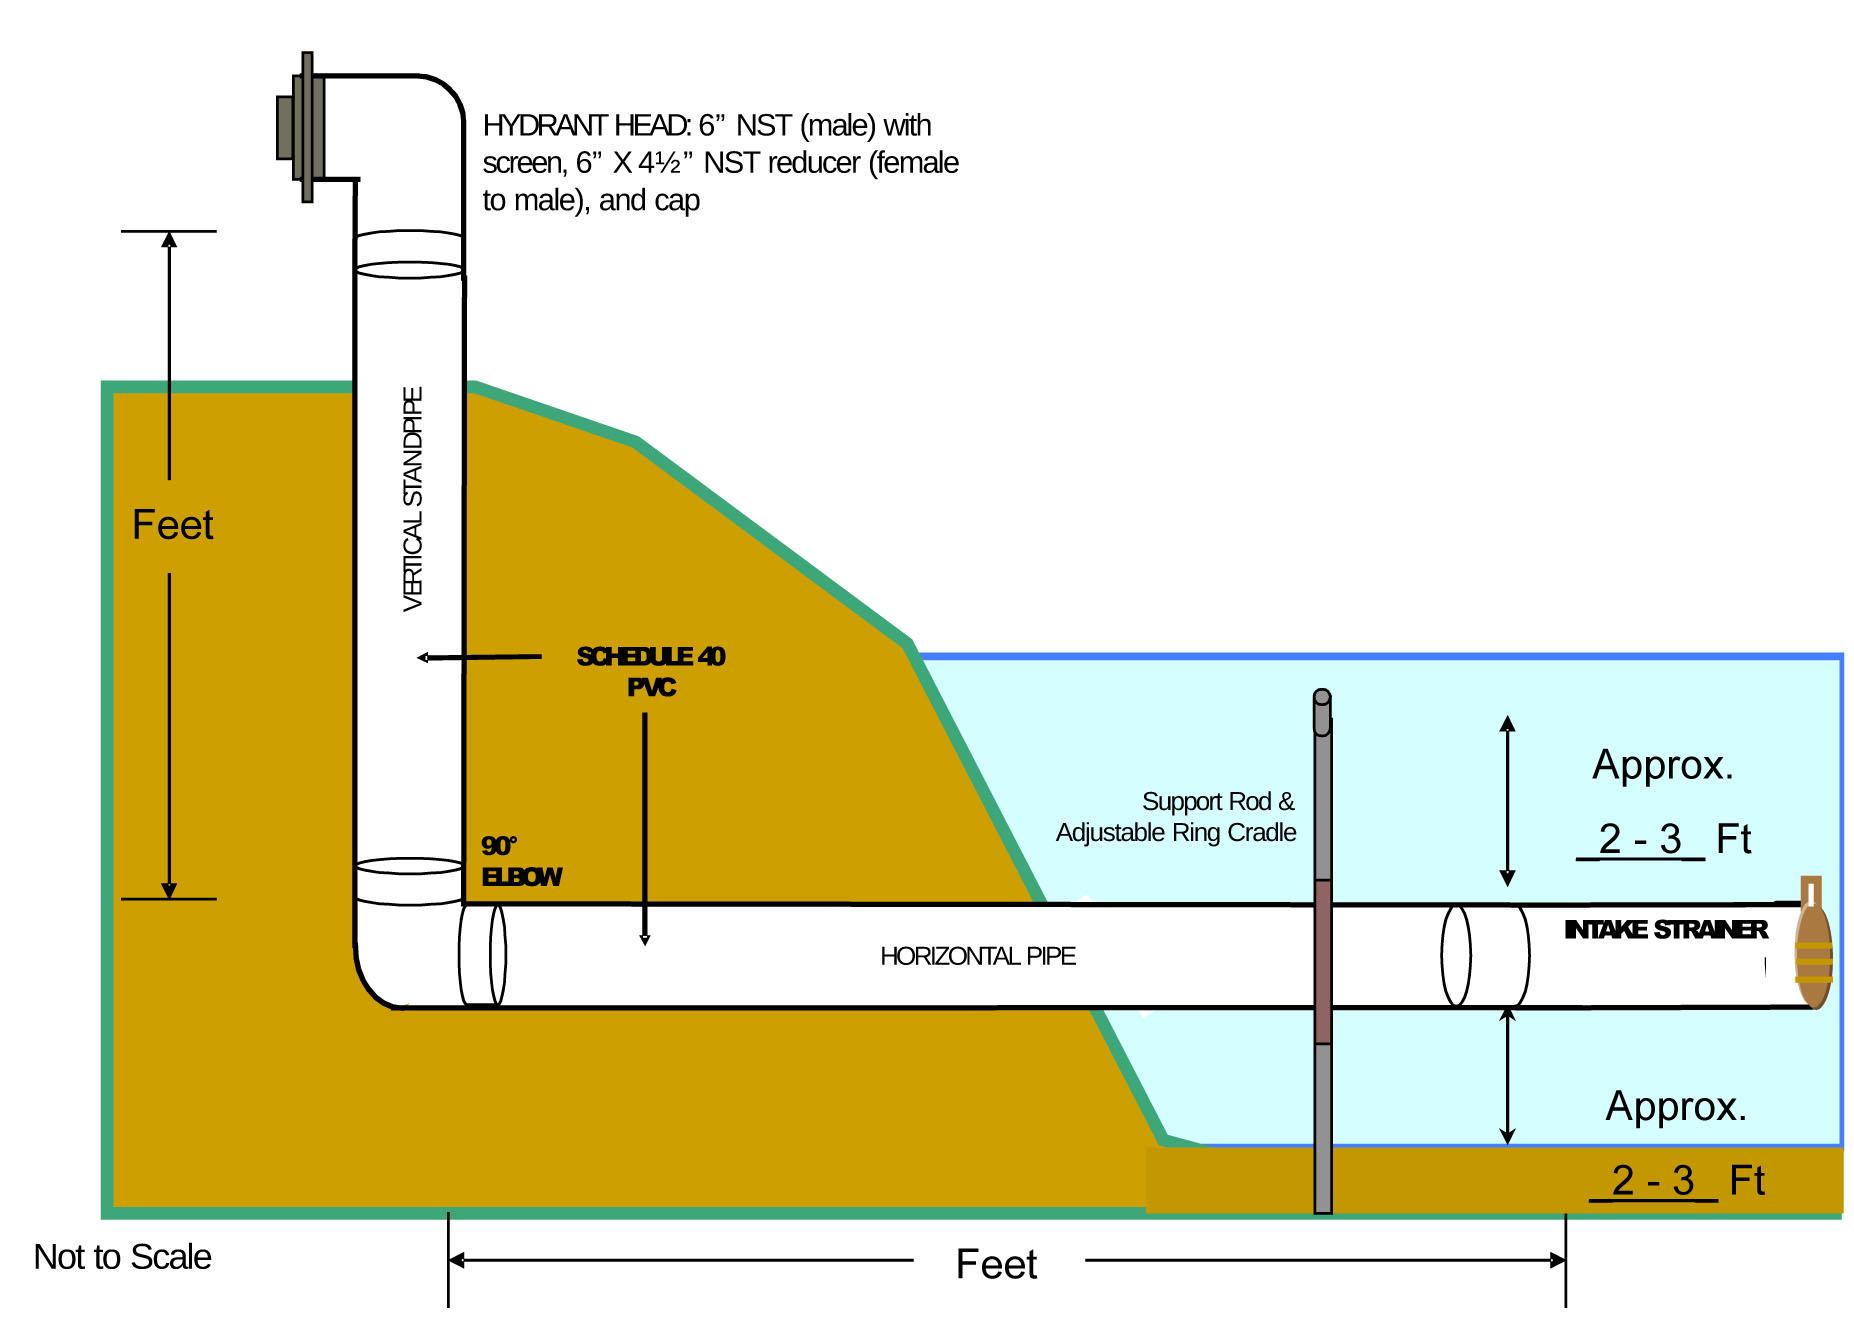 basic fire hydrant diagram minn kota riptide 55 wiring dry hydrants city of angola indiana